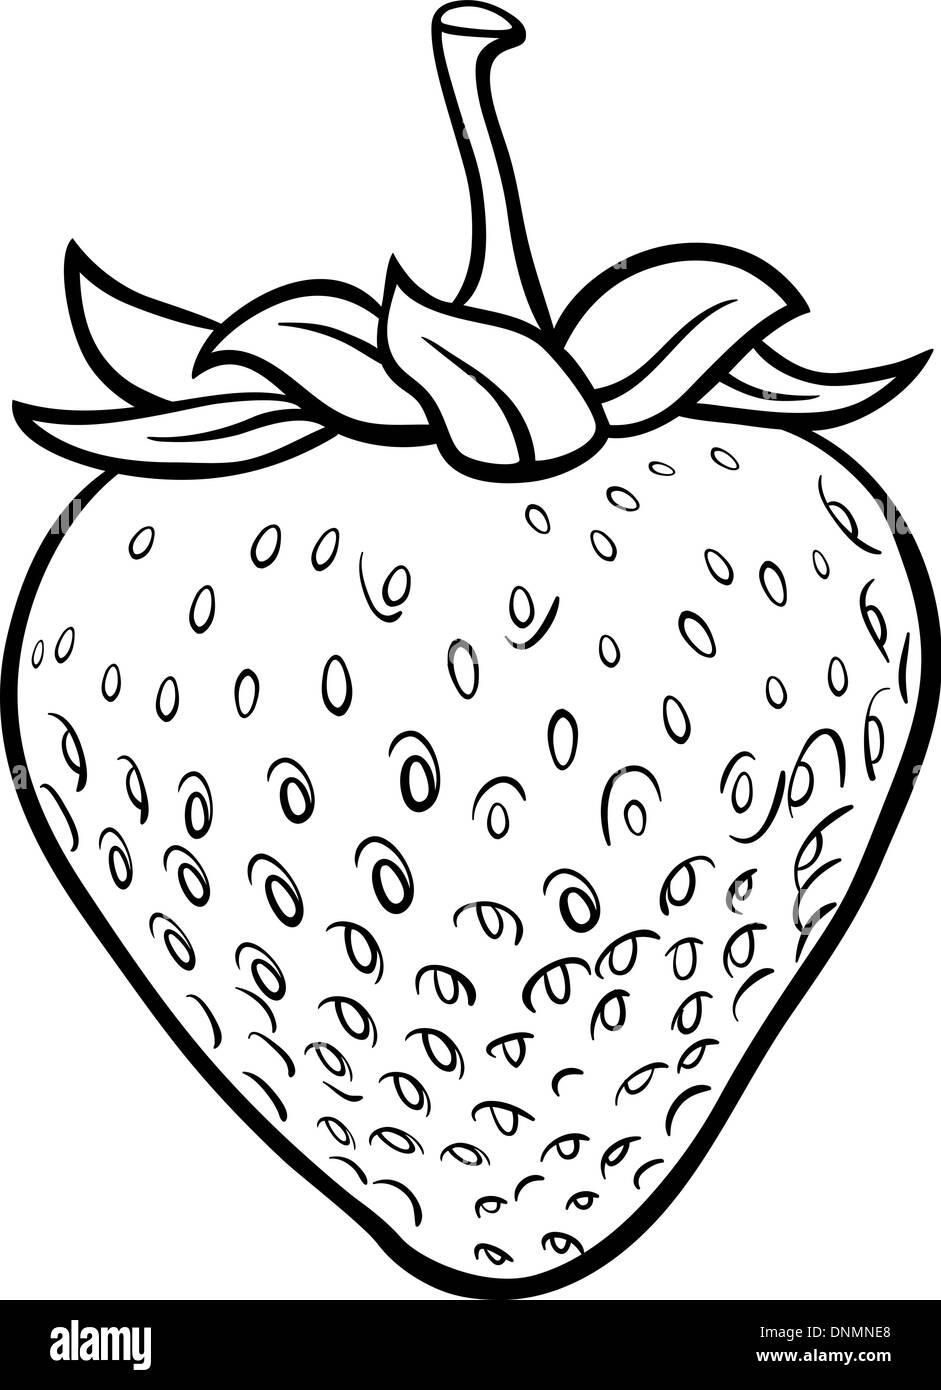 Black And White Cartoon Illustration Of Strawberry Fruit